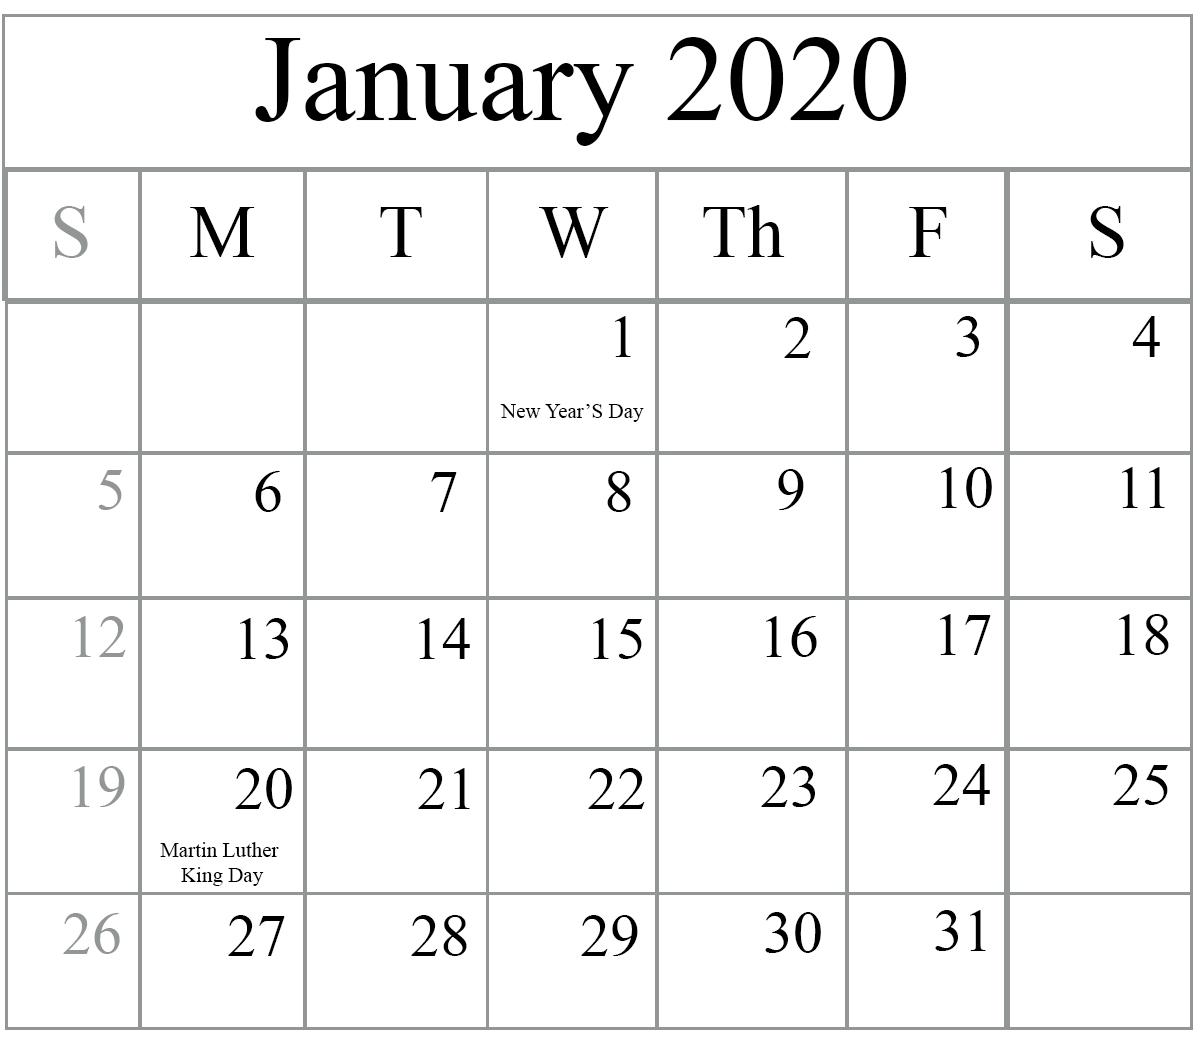 Free January 2020 Printable Calendar In Pdf, Excel & Word-January 2020 Calendar Singapore